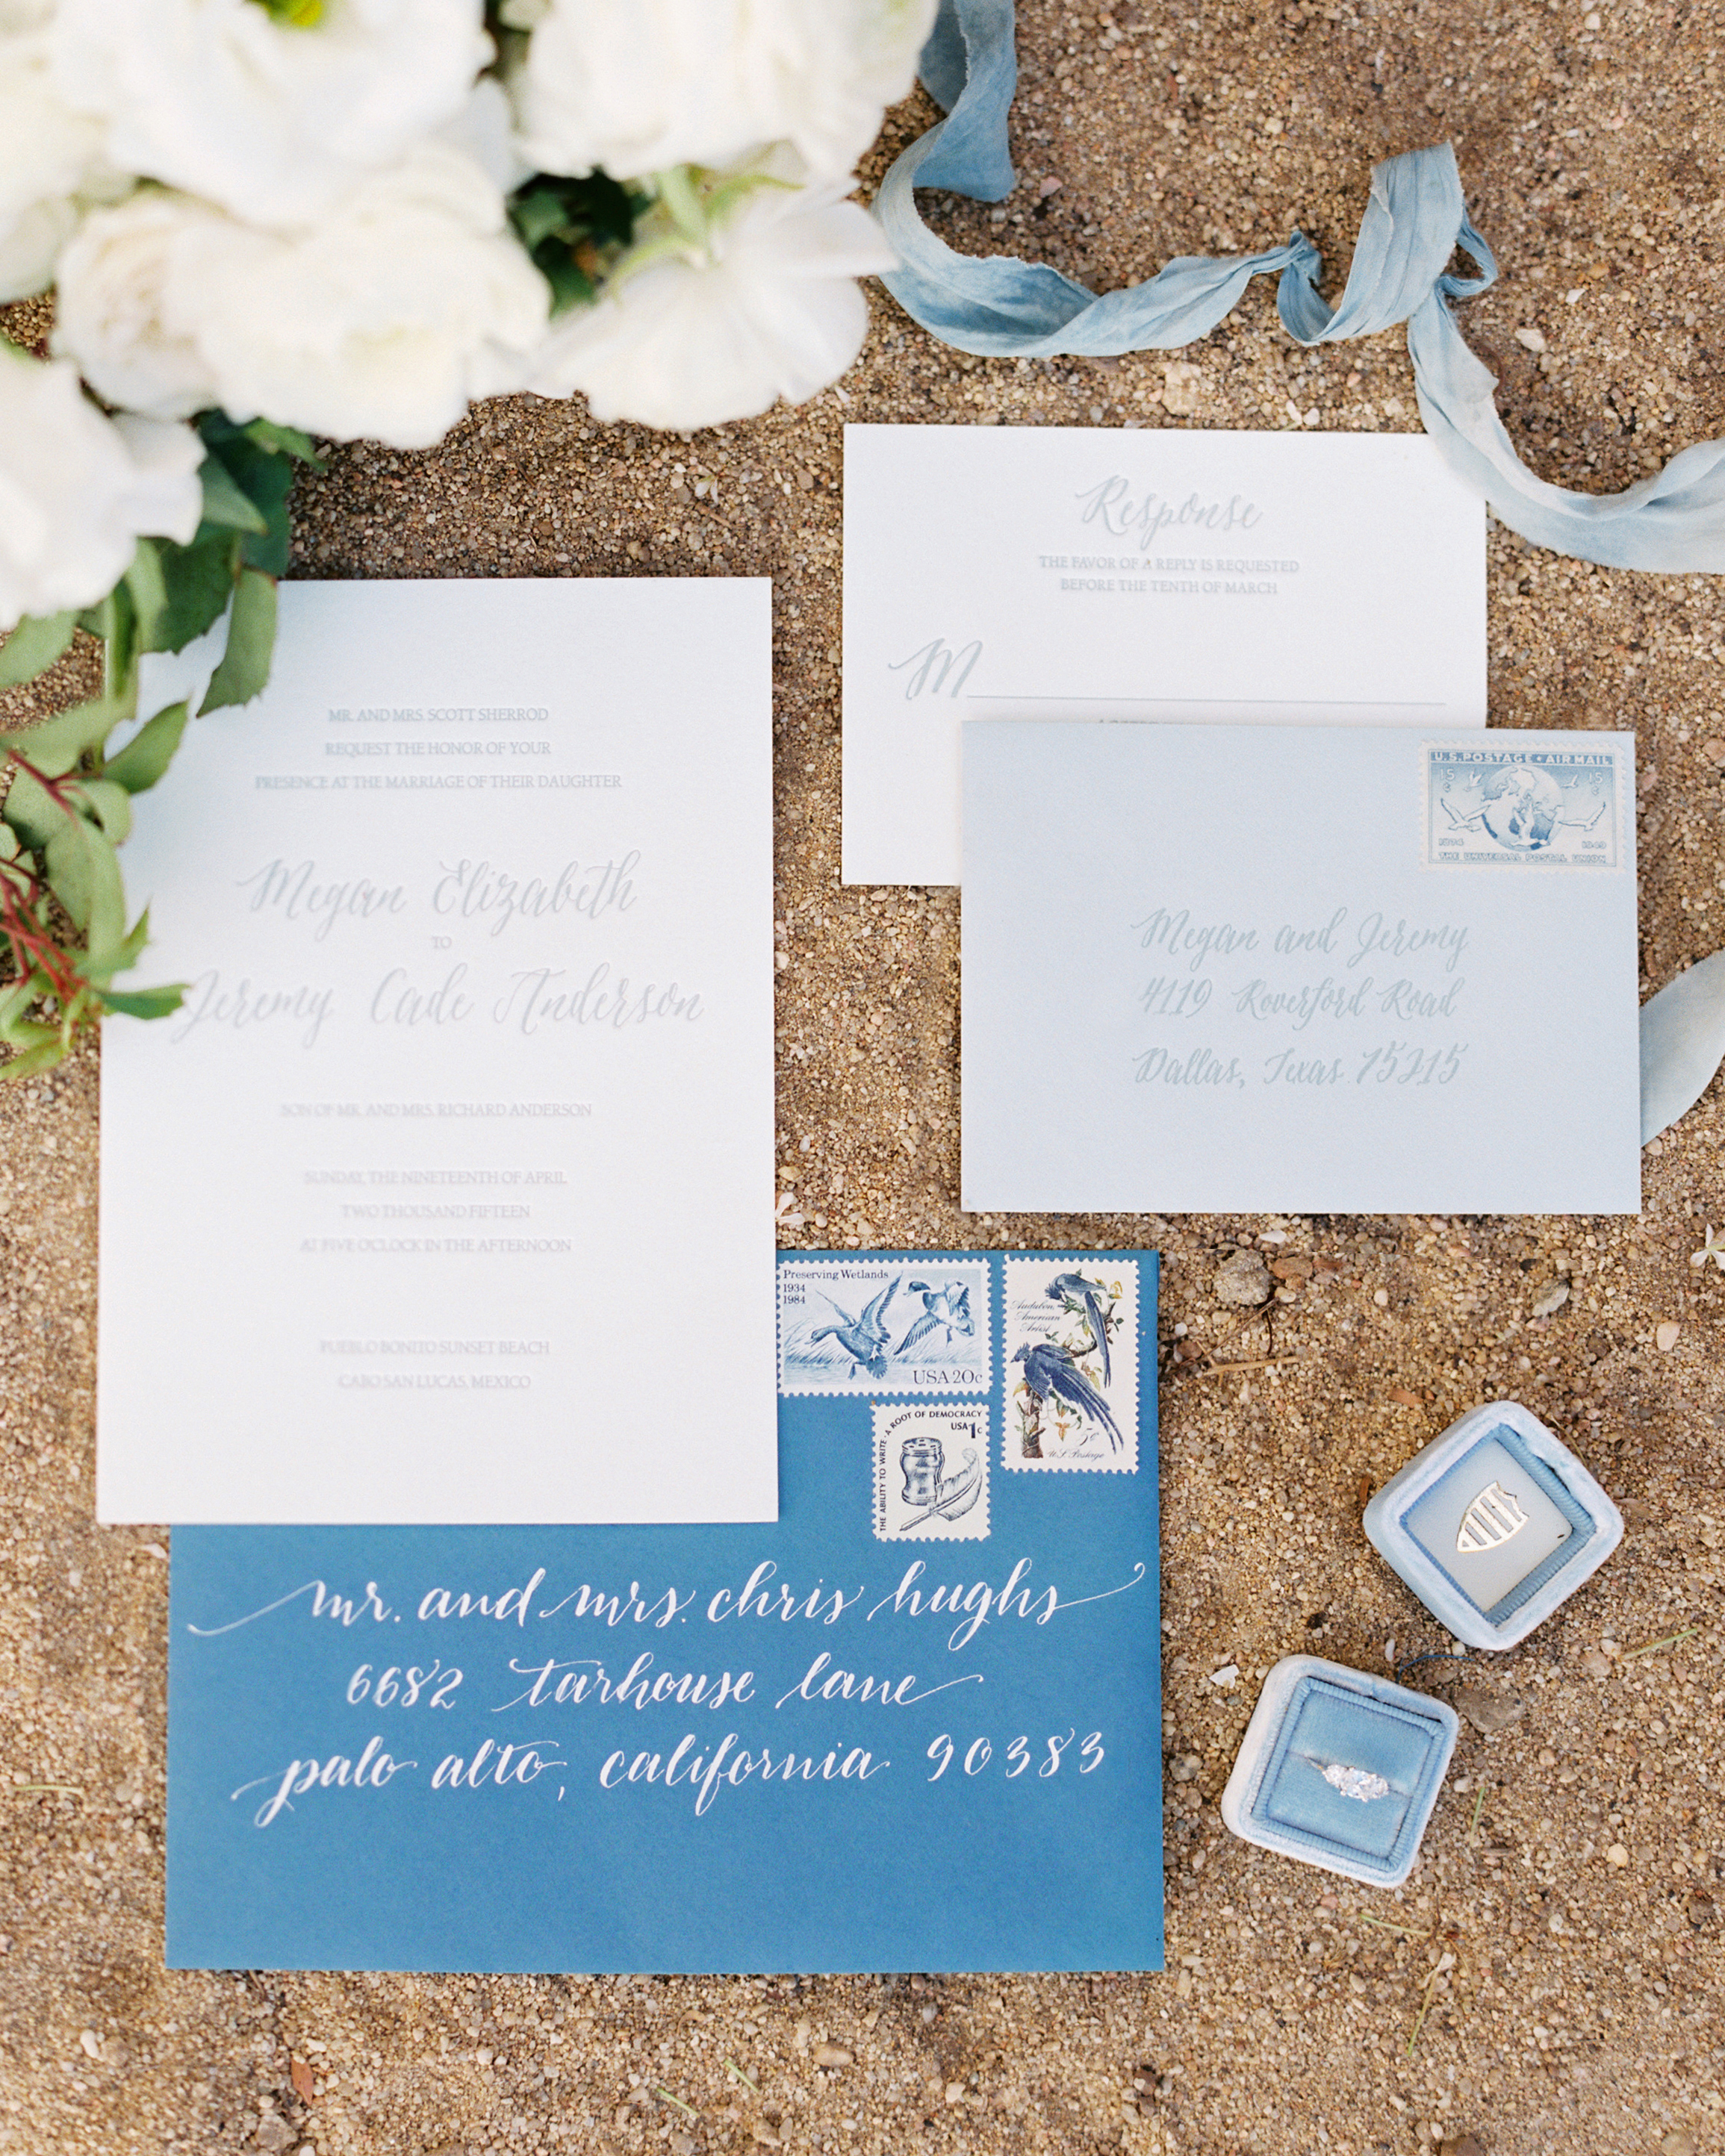 megan-jeremy-wedding-invite-06-s112680-0216.jpg